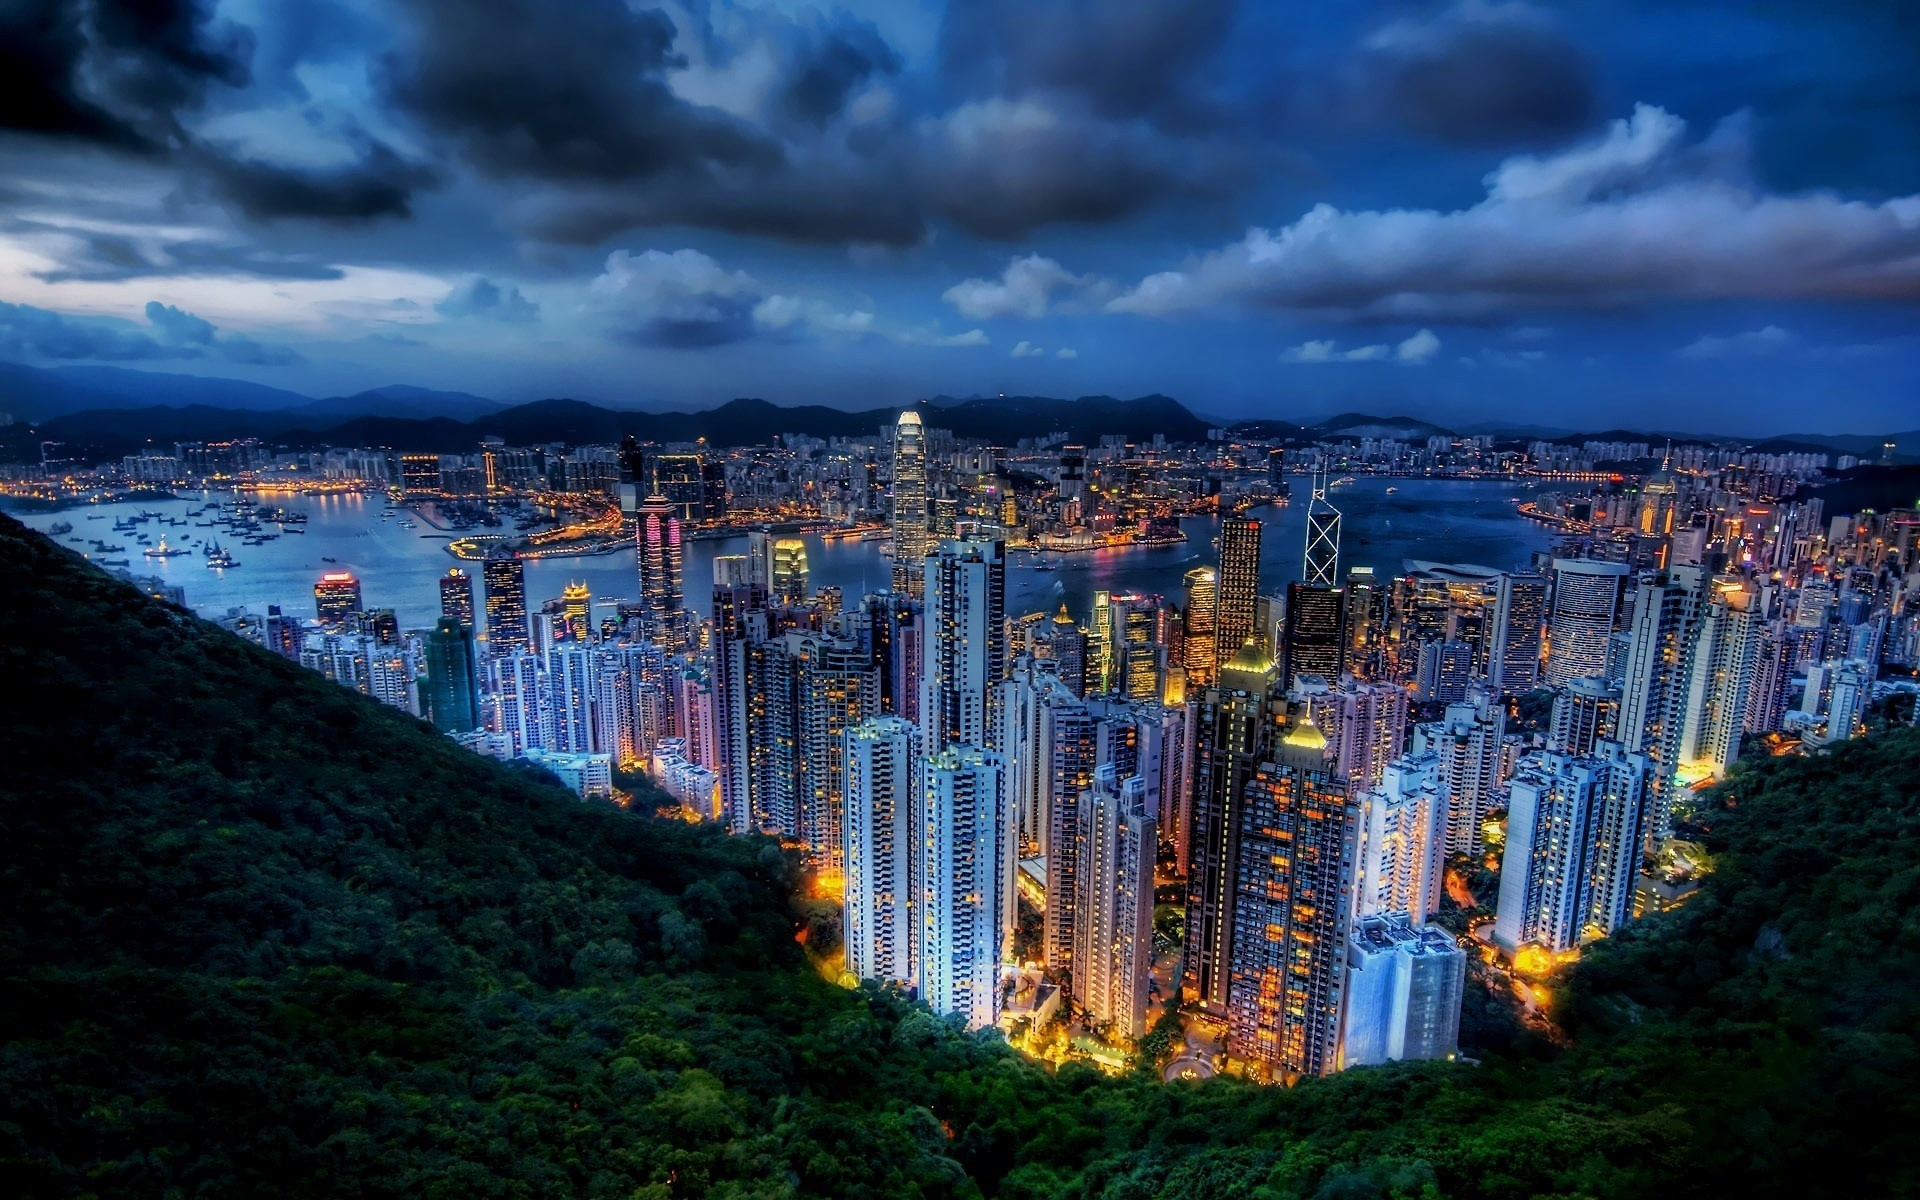 Cityscapes buildings hong kong city skyline wallpaper | | 16060 |  WallpaperUP